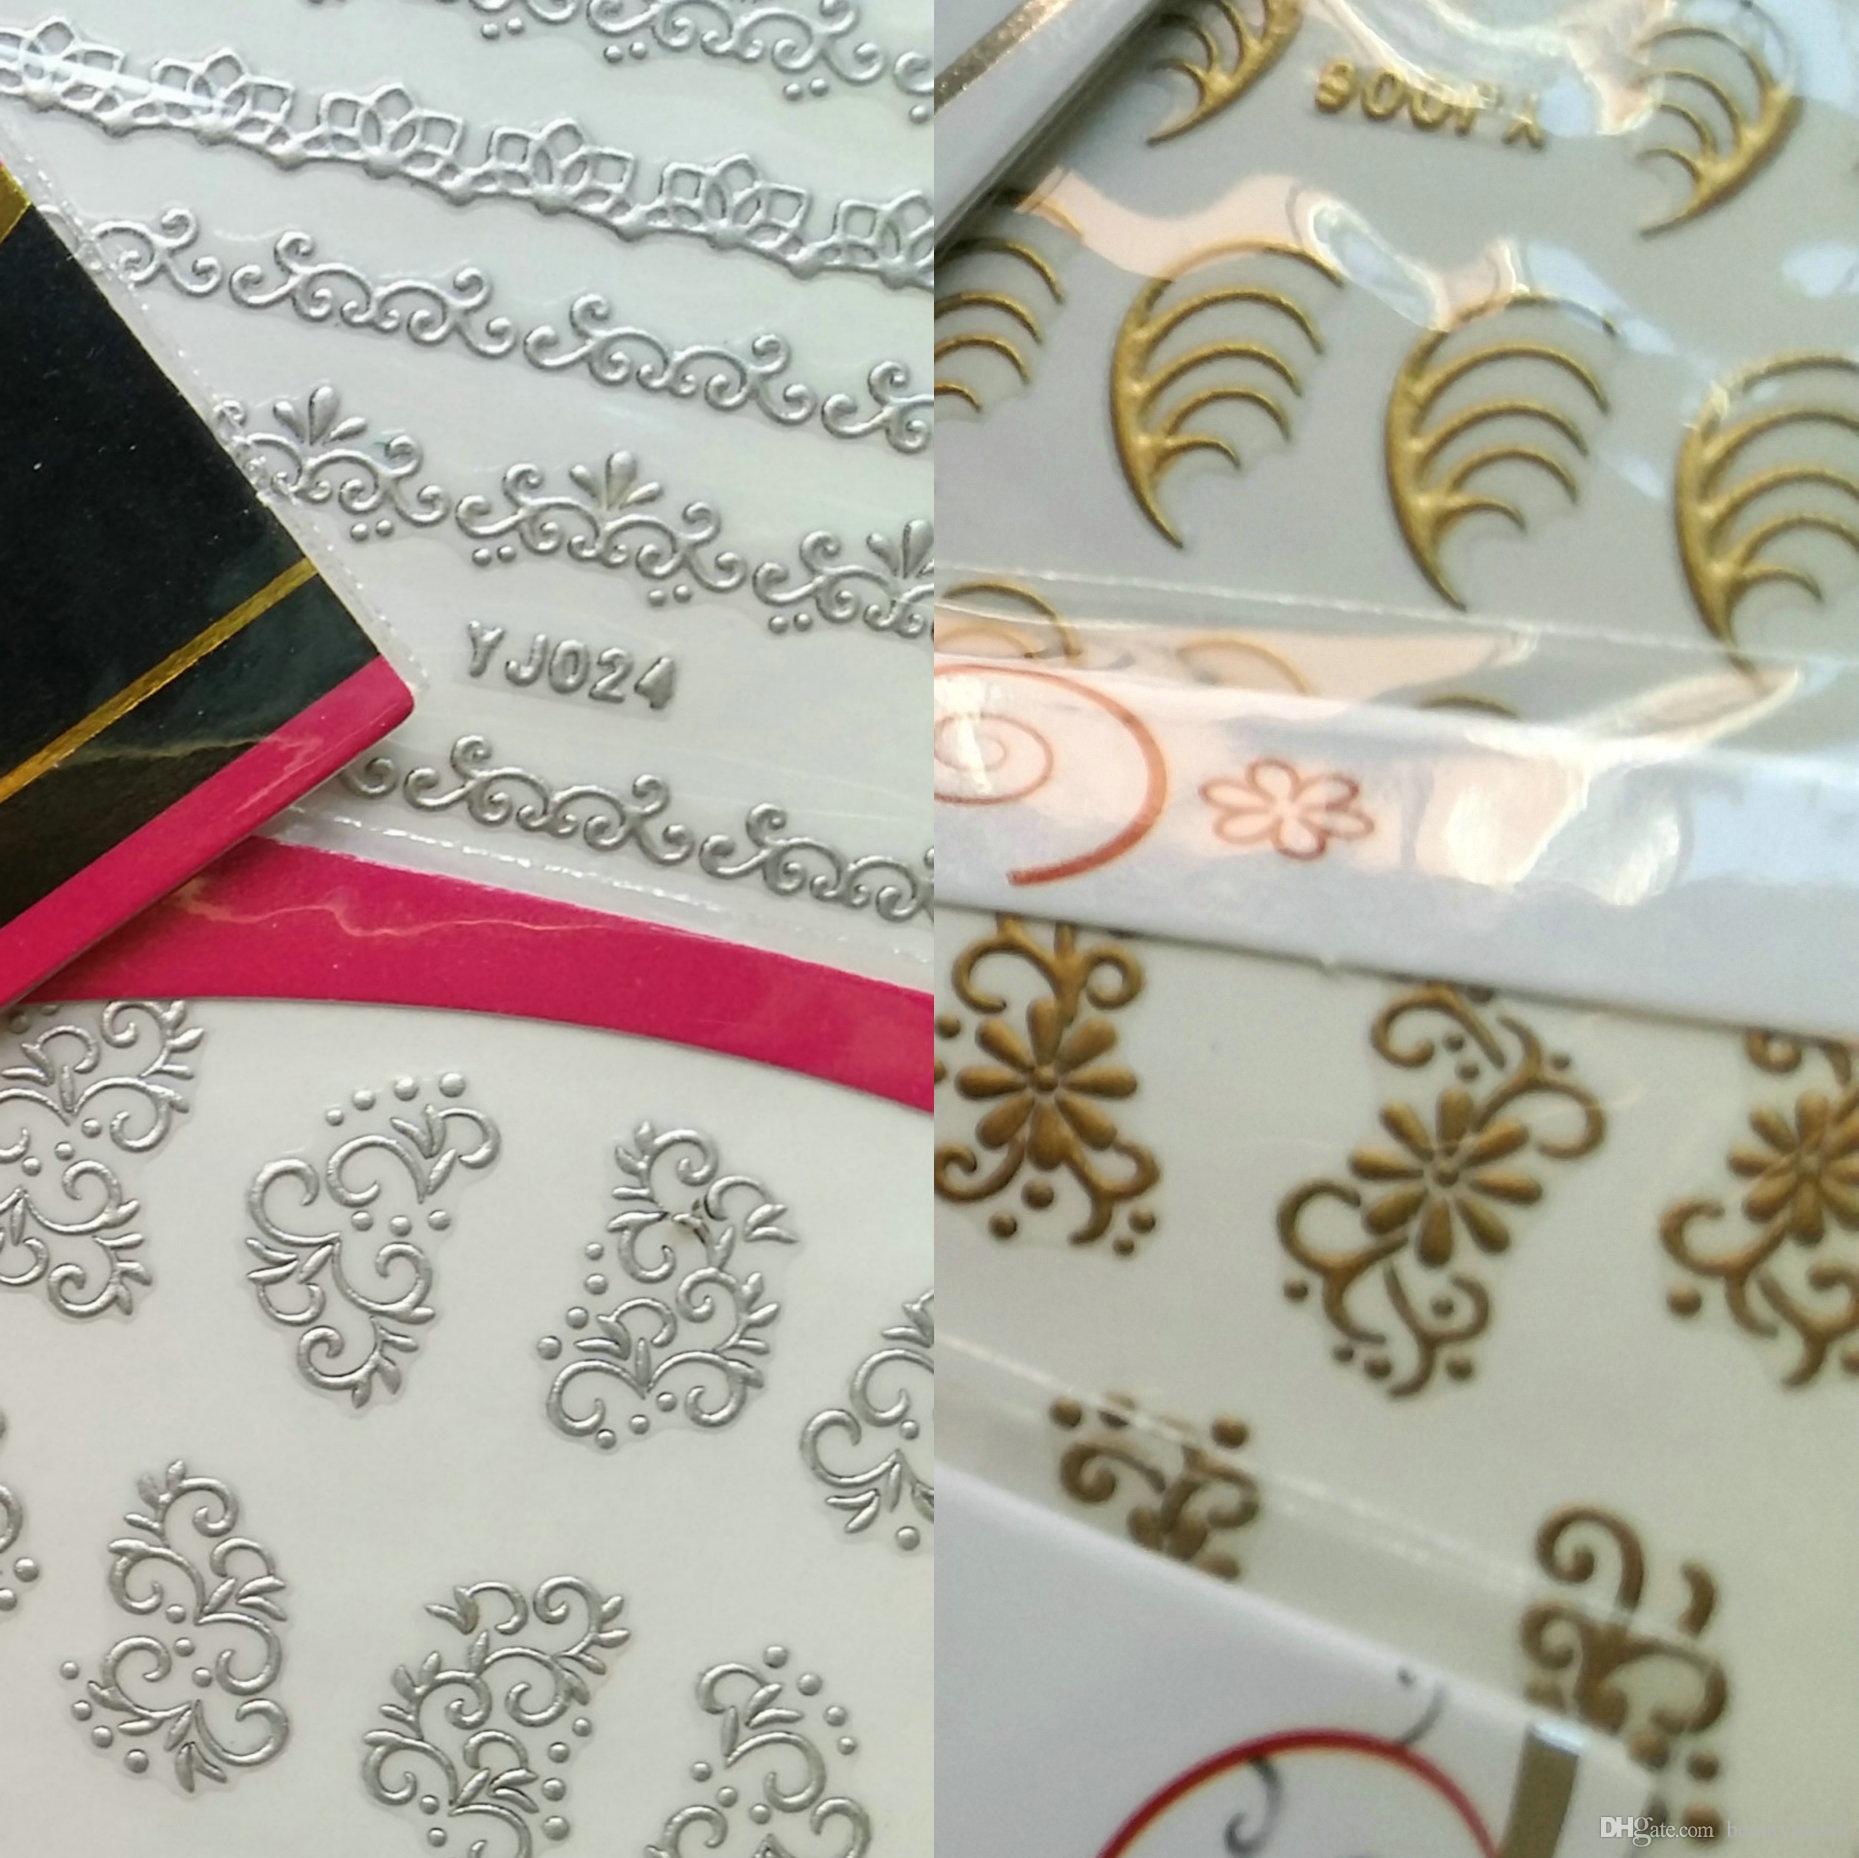 48 stücke * 24x Gold + 24x Silber Metall Metallic Nail Sticker Aufkleber Decals SWIRL FLOWER LACE BUTTERFLY Retro Designs Klebstoff Appliques Tipps DIY